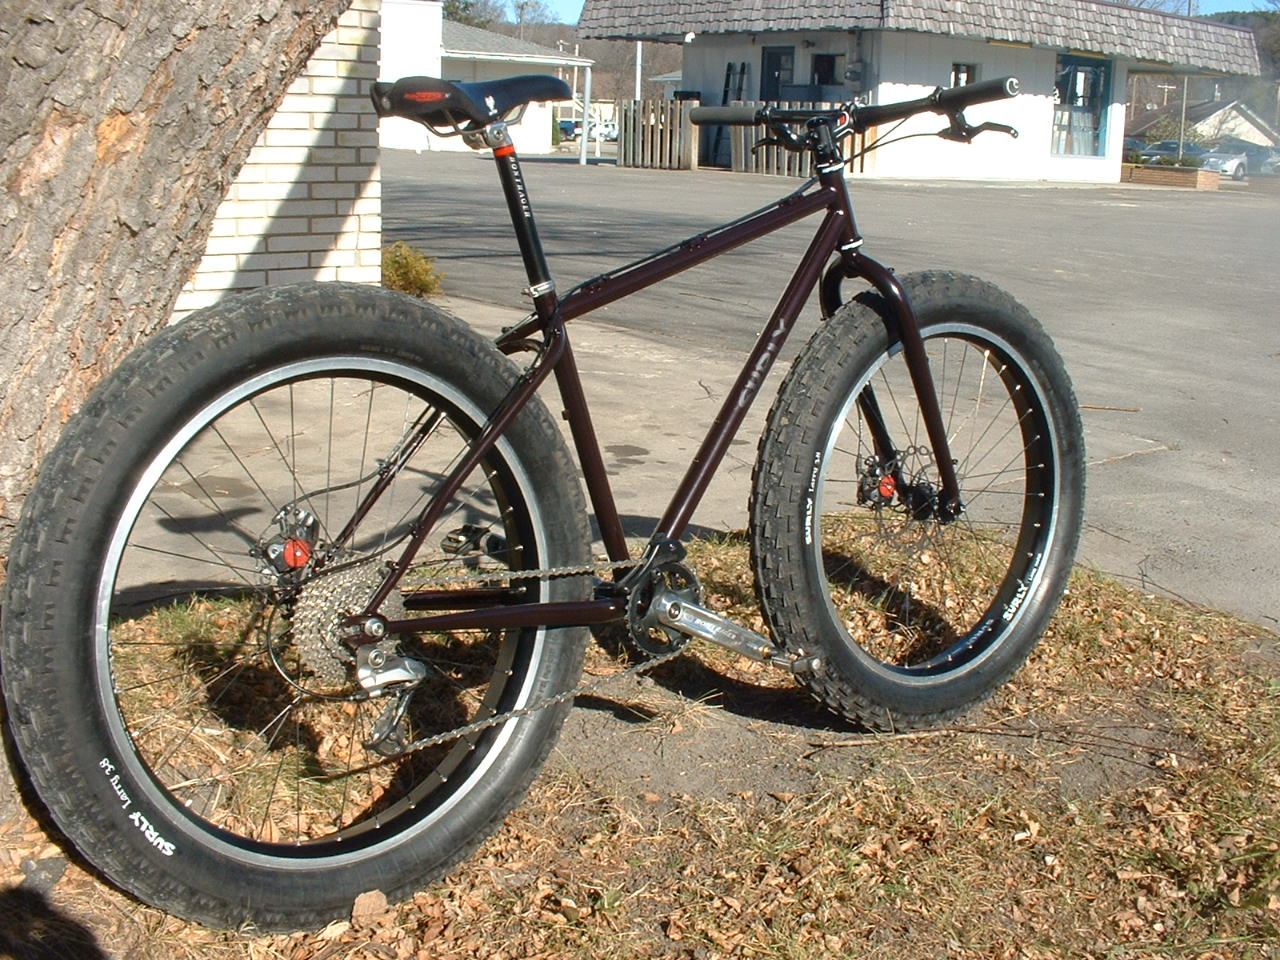 Daily fatbike pic thread-dscf0522.jpg